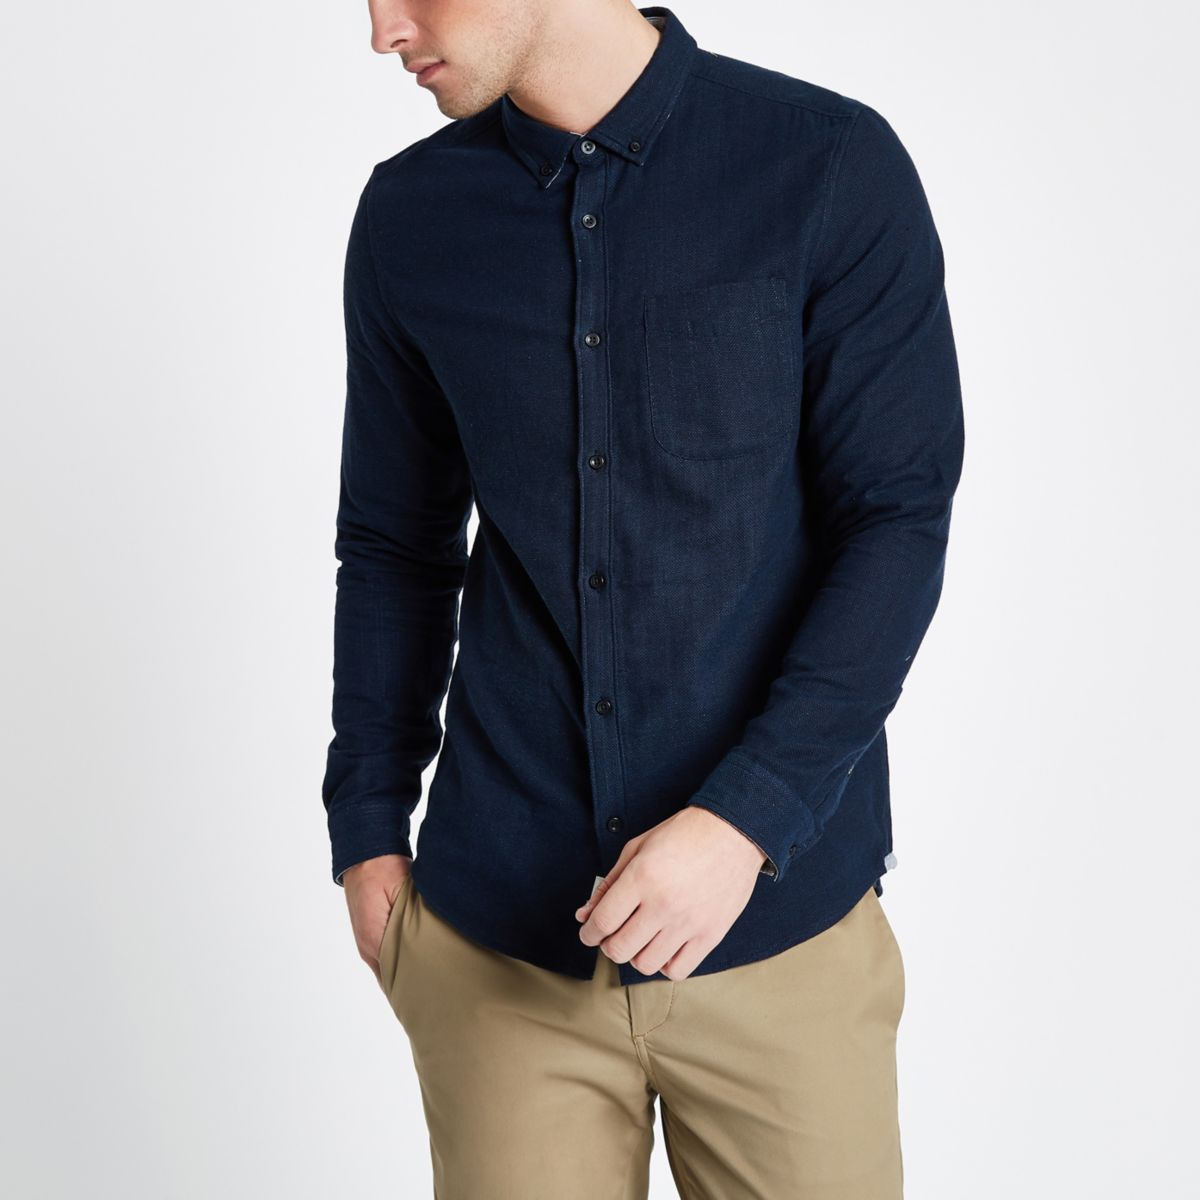 Navy long sleeve double face shirt